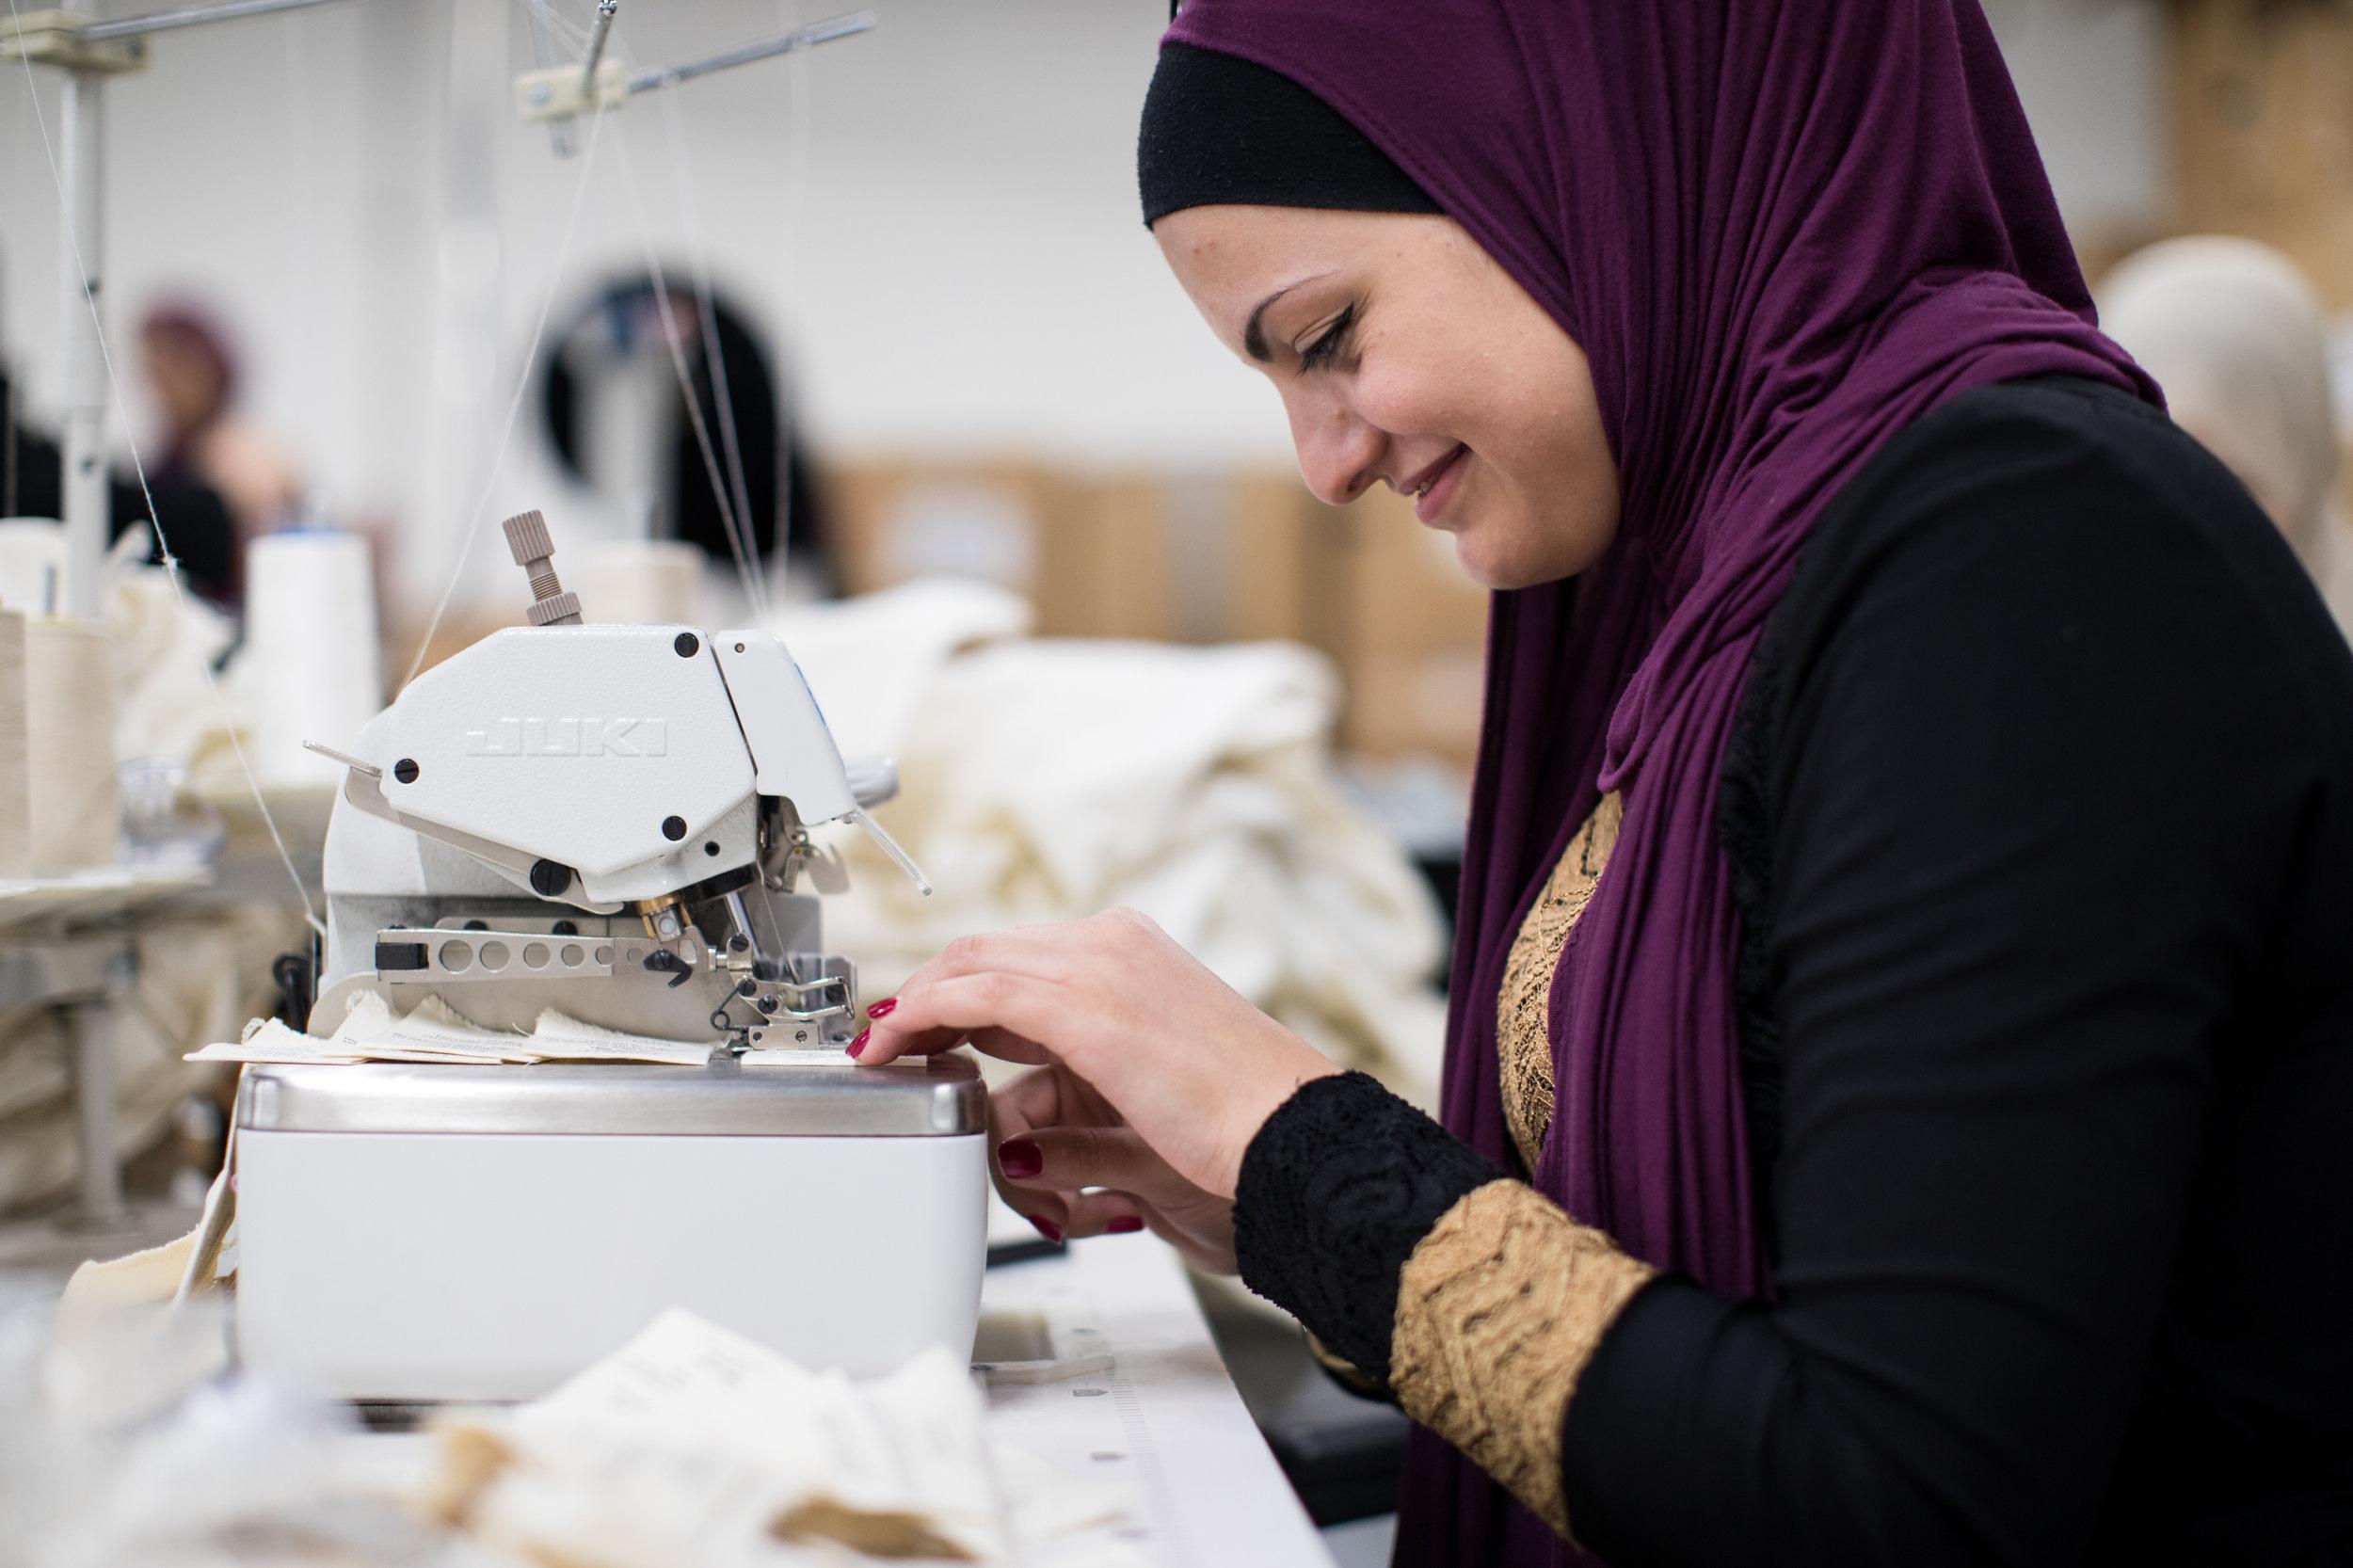 2018-06-23_Raneem Faisal, Teenah textile company, Irbid, JO_d1_0055.jpg